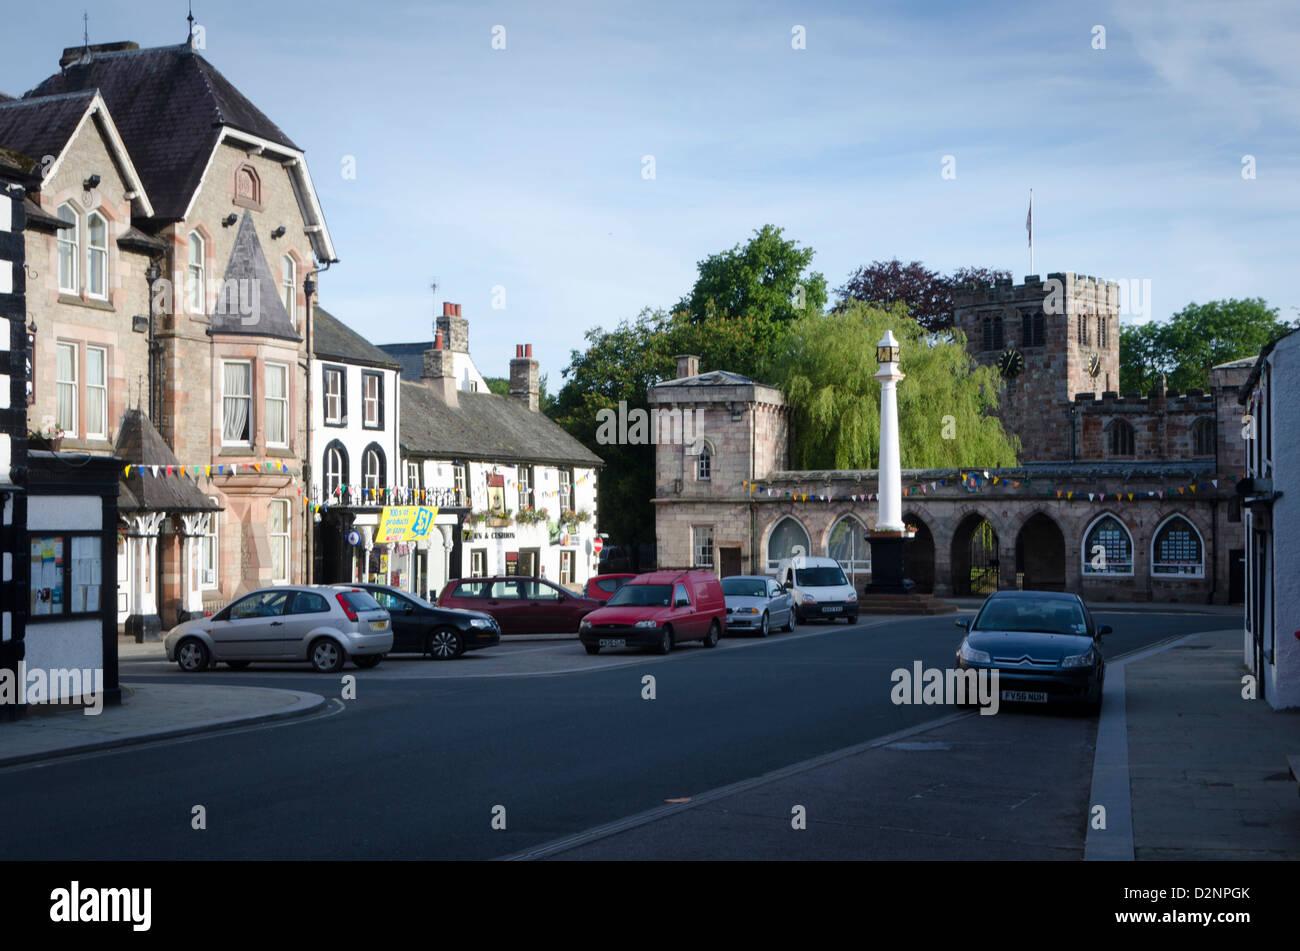 Boroughgate, market square, Appleby-in-Westmorland, Cumbria, England, Britain - Stock Image